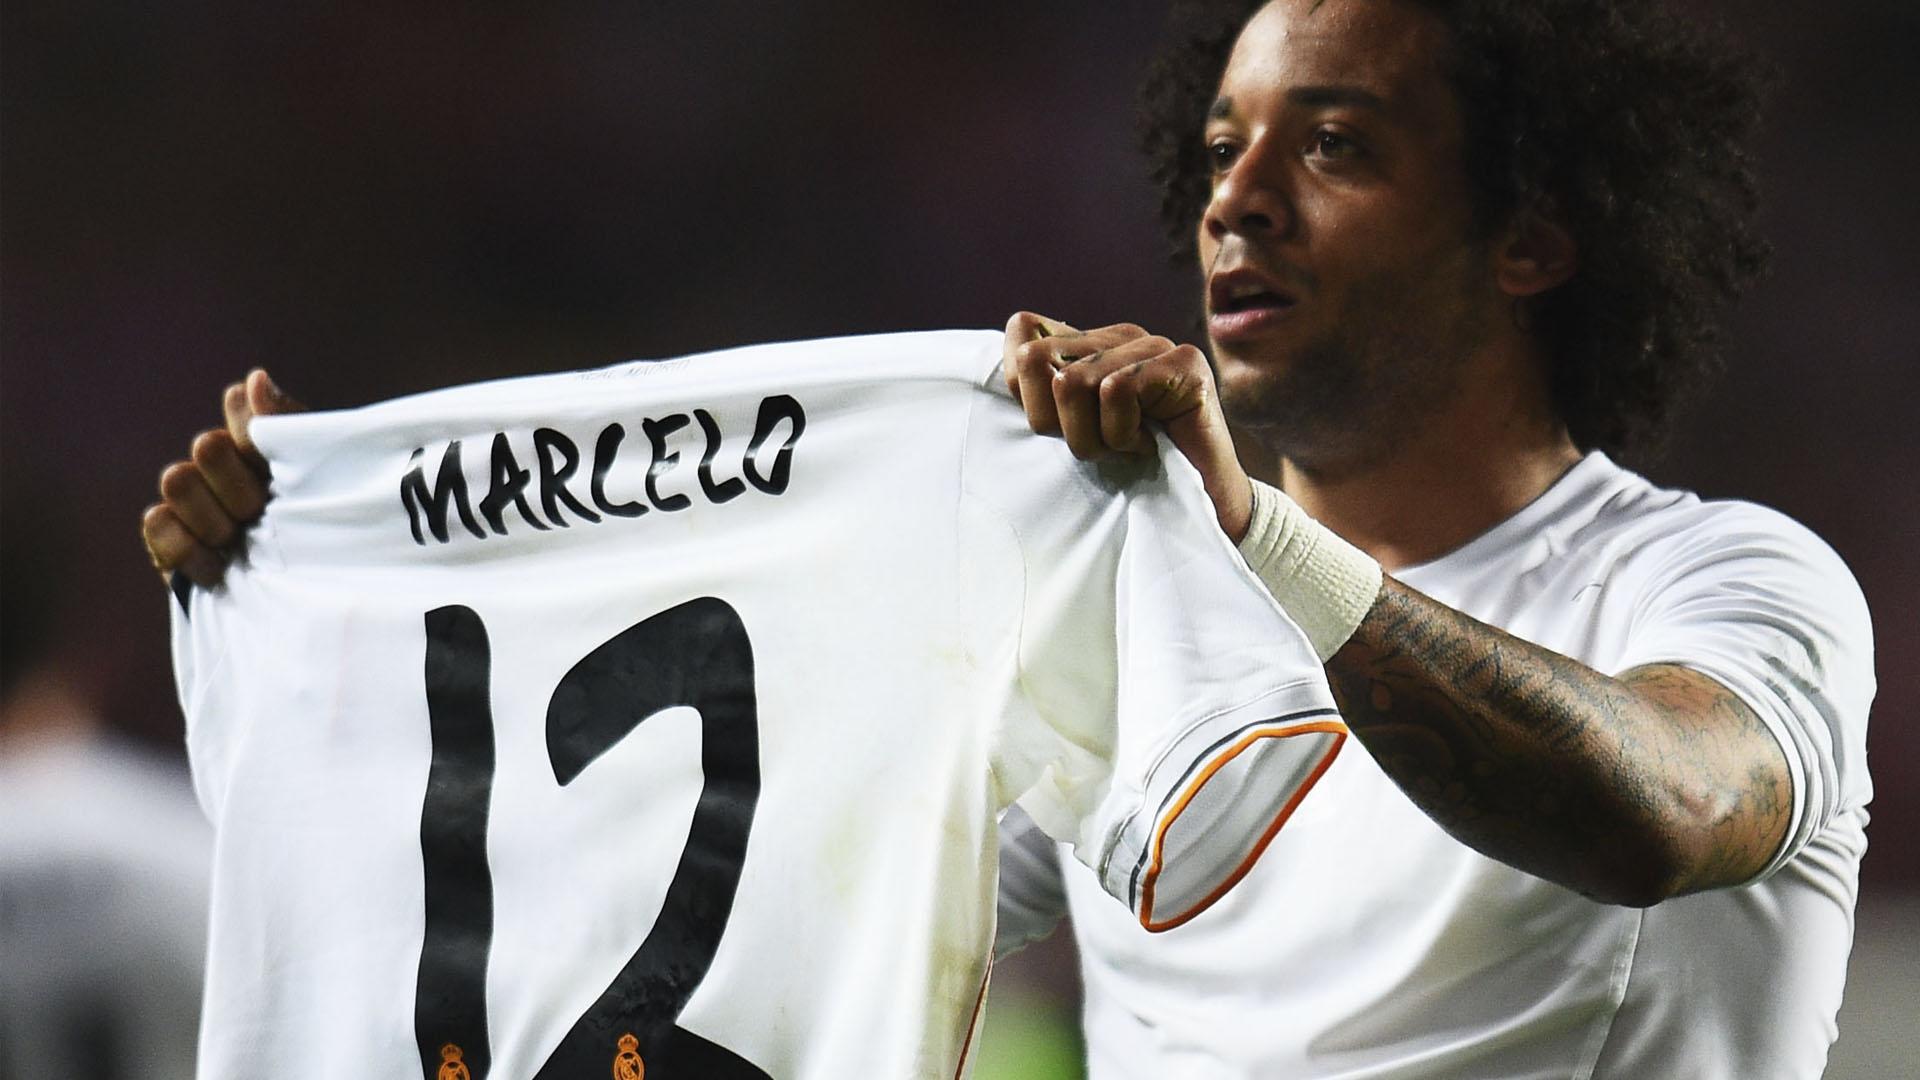 Marcelo Real Madrid x Atlético Madrid 24 05 14